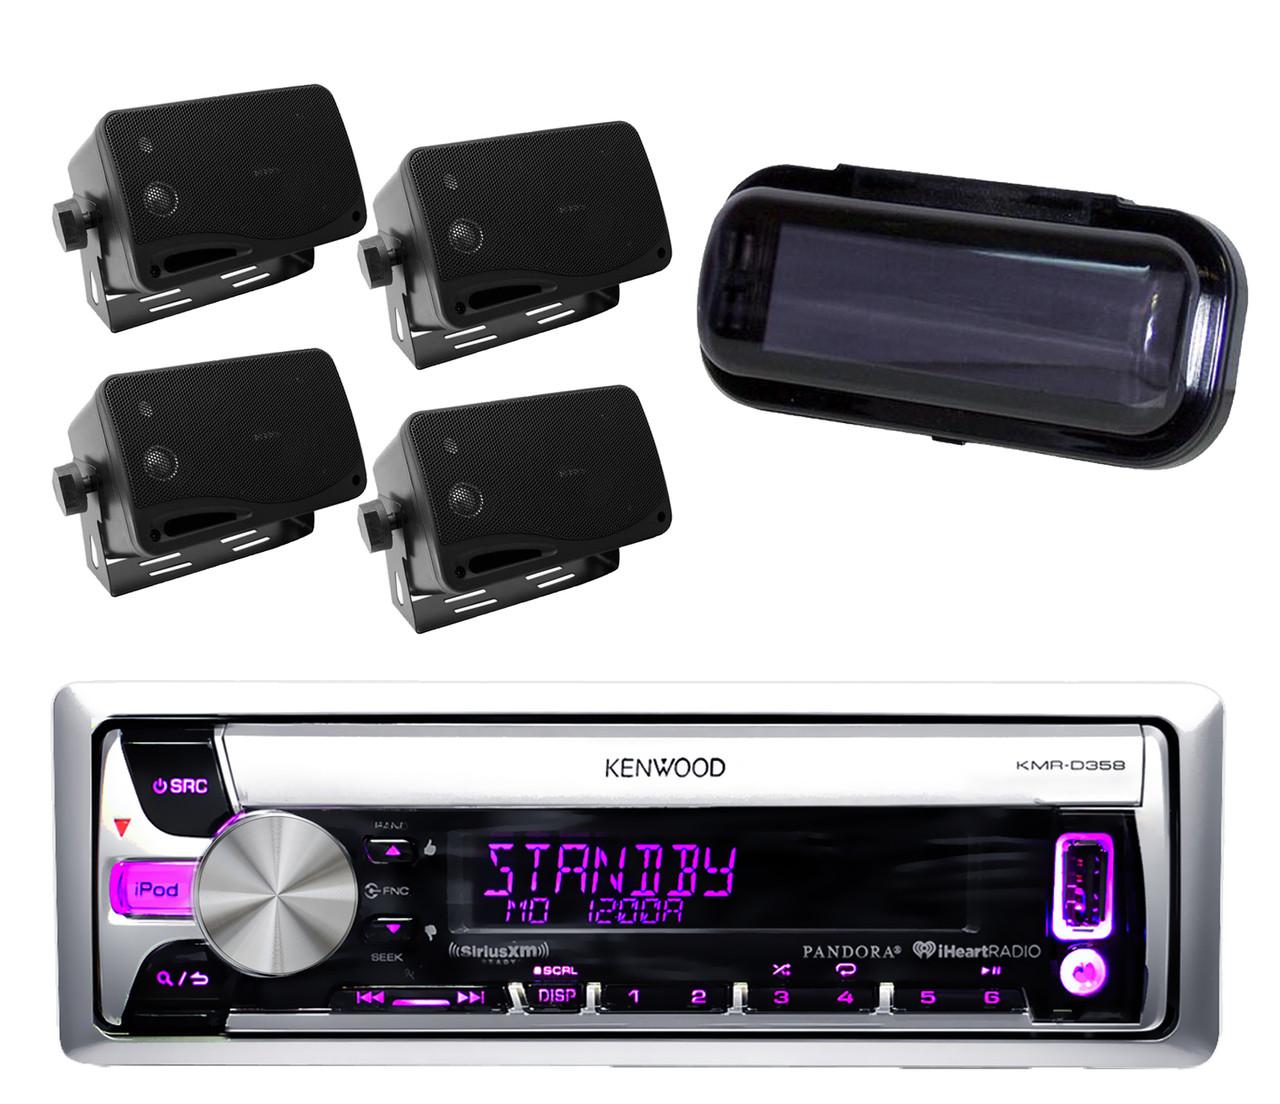 kenwood new kmr d358 iphone ipod pandora radio player 4 black box ouku wiring harness kenwood kmr d358 wiring harness [ 1280 x 1104 Pixel ]